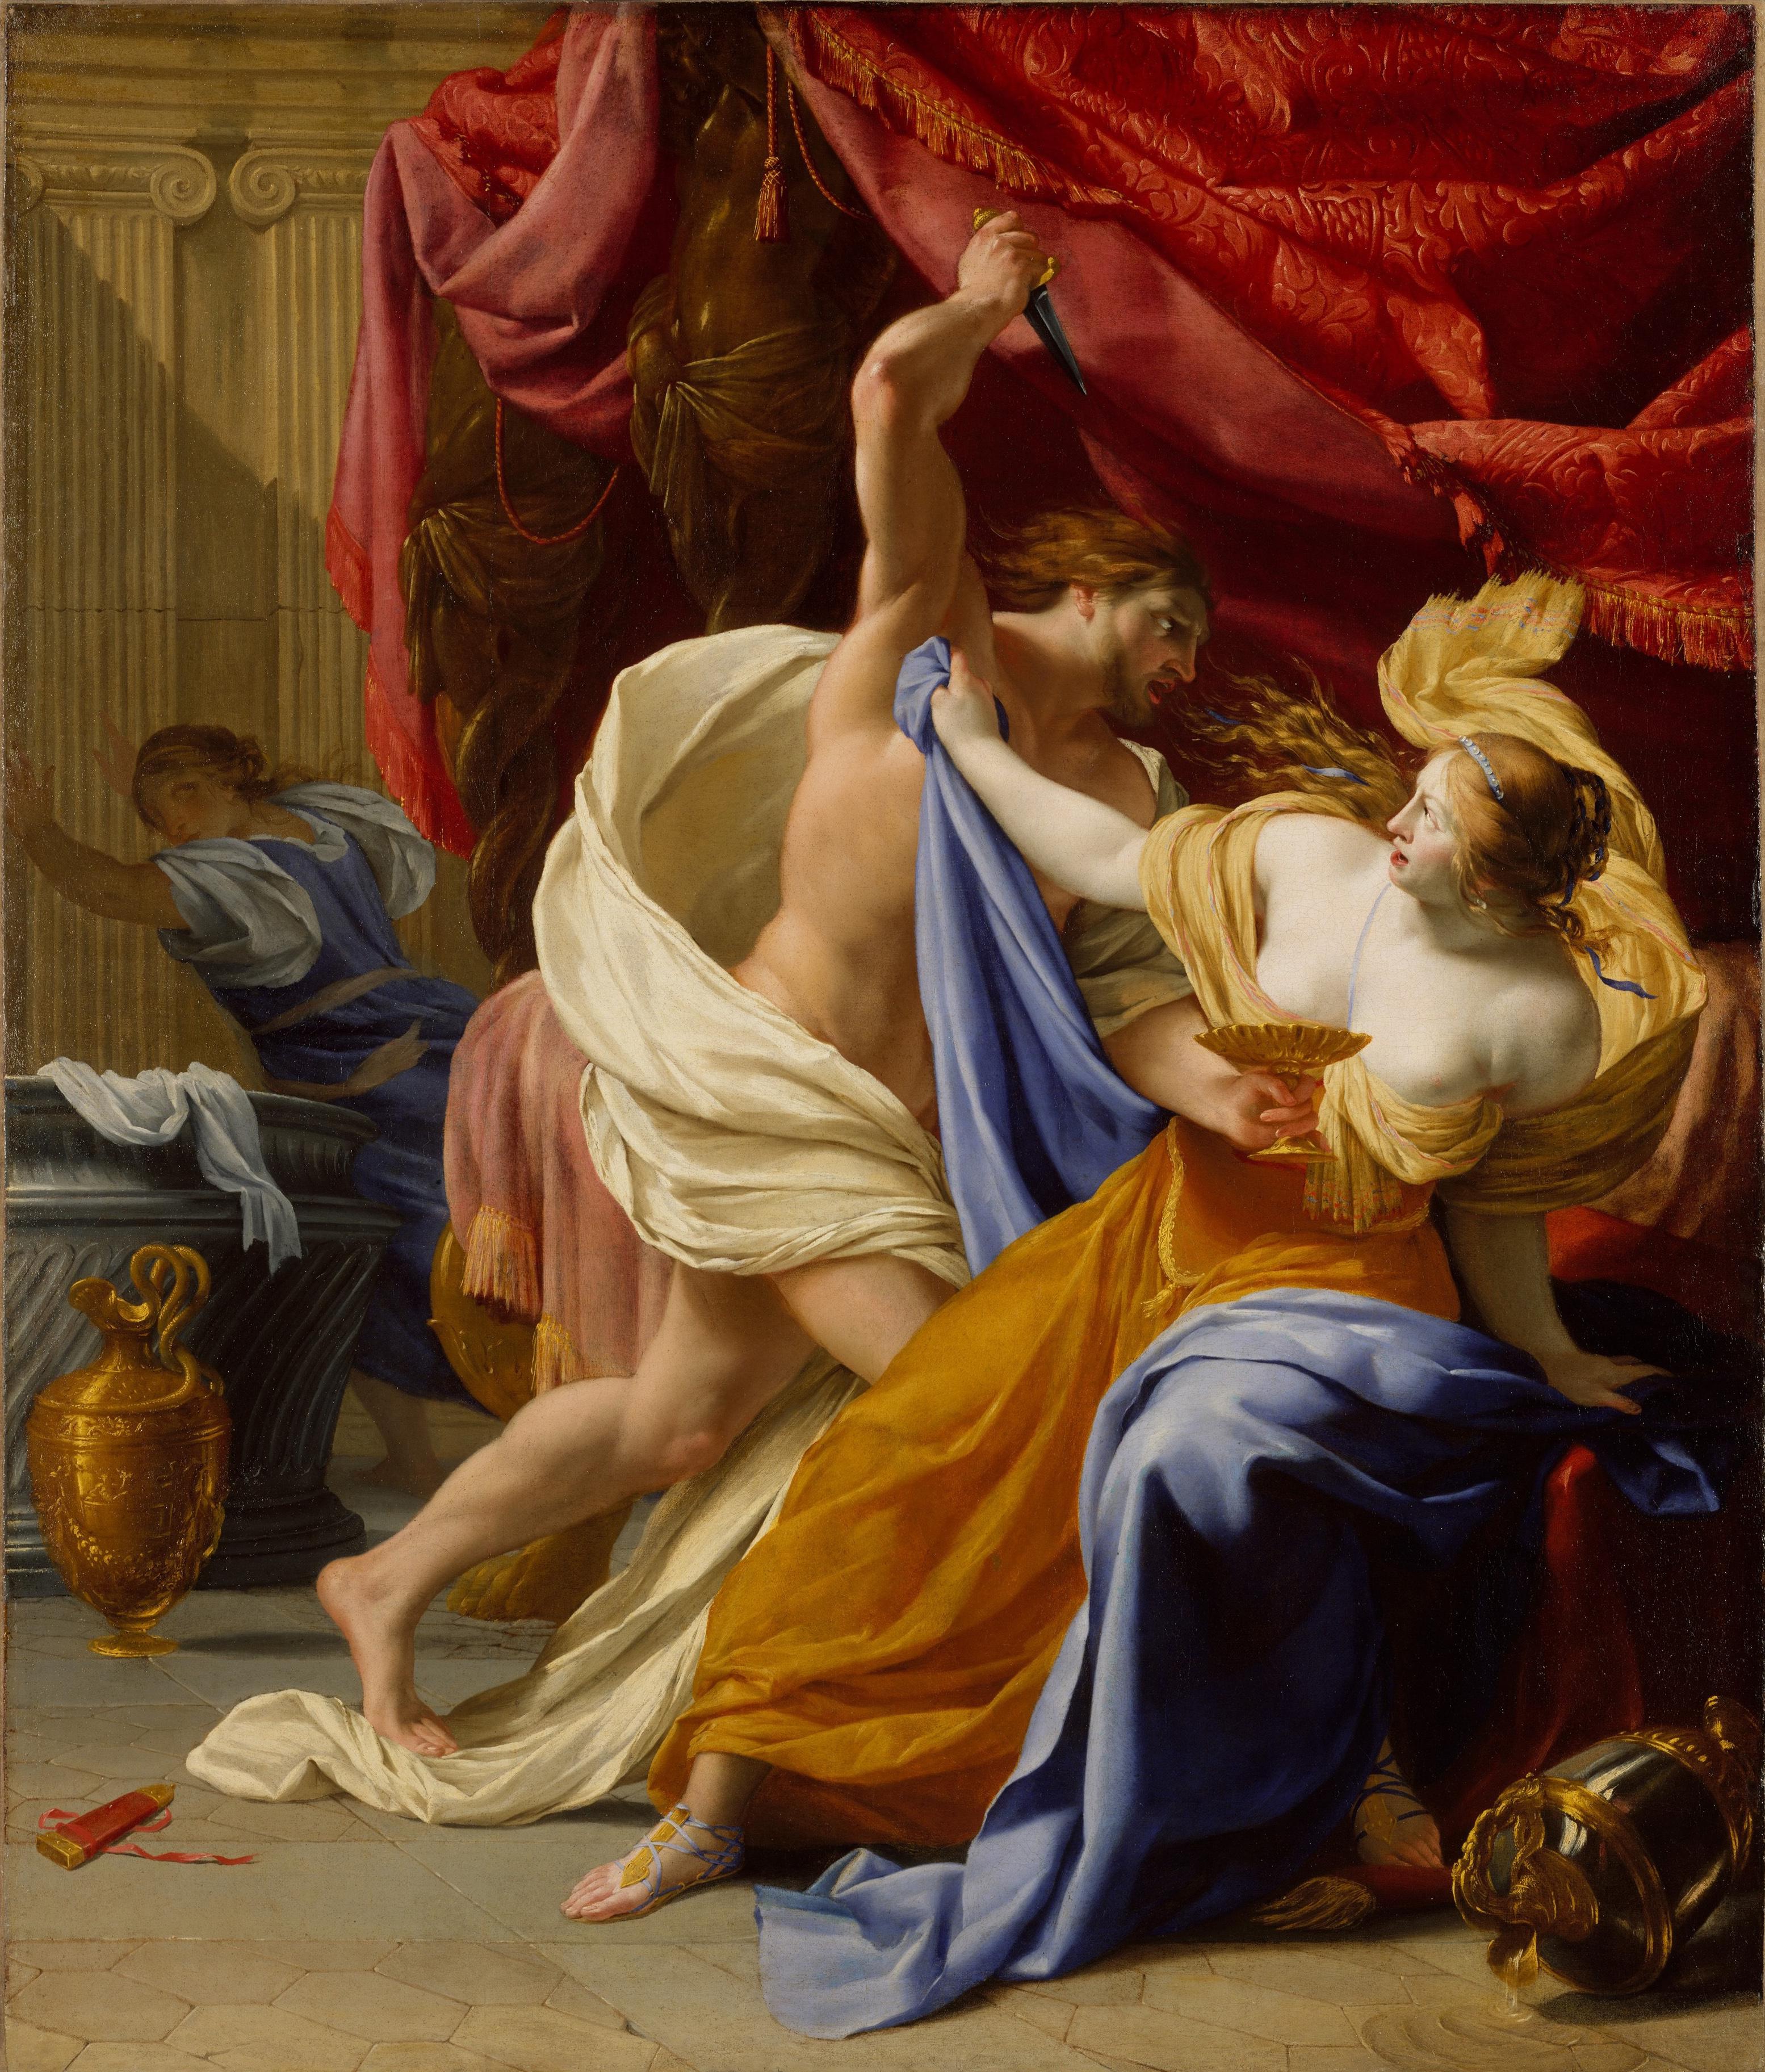 https://upload.wikimedia.org/wikipedia/commons/b/bc/Rape_of_Tamar_-_Le_Seur_trim.jpg